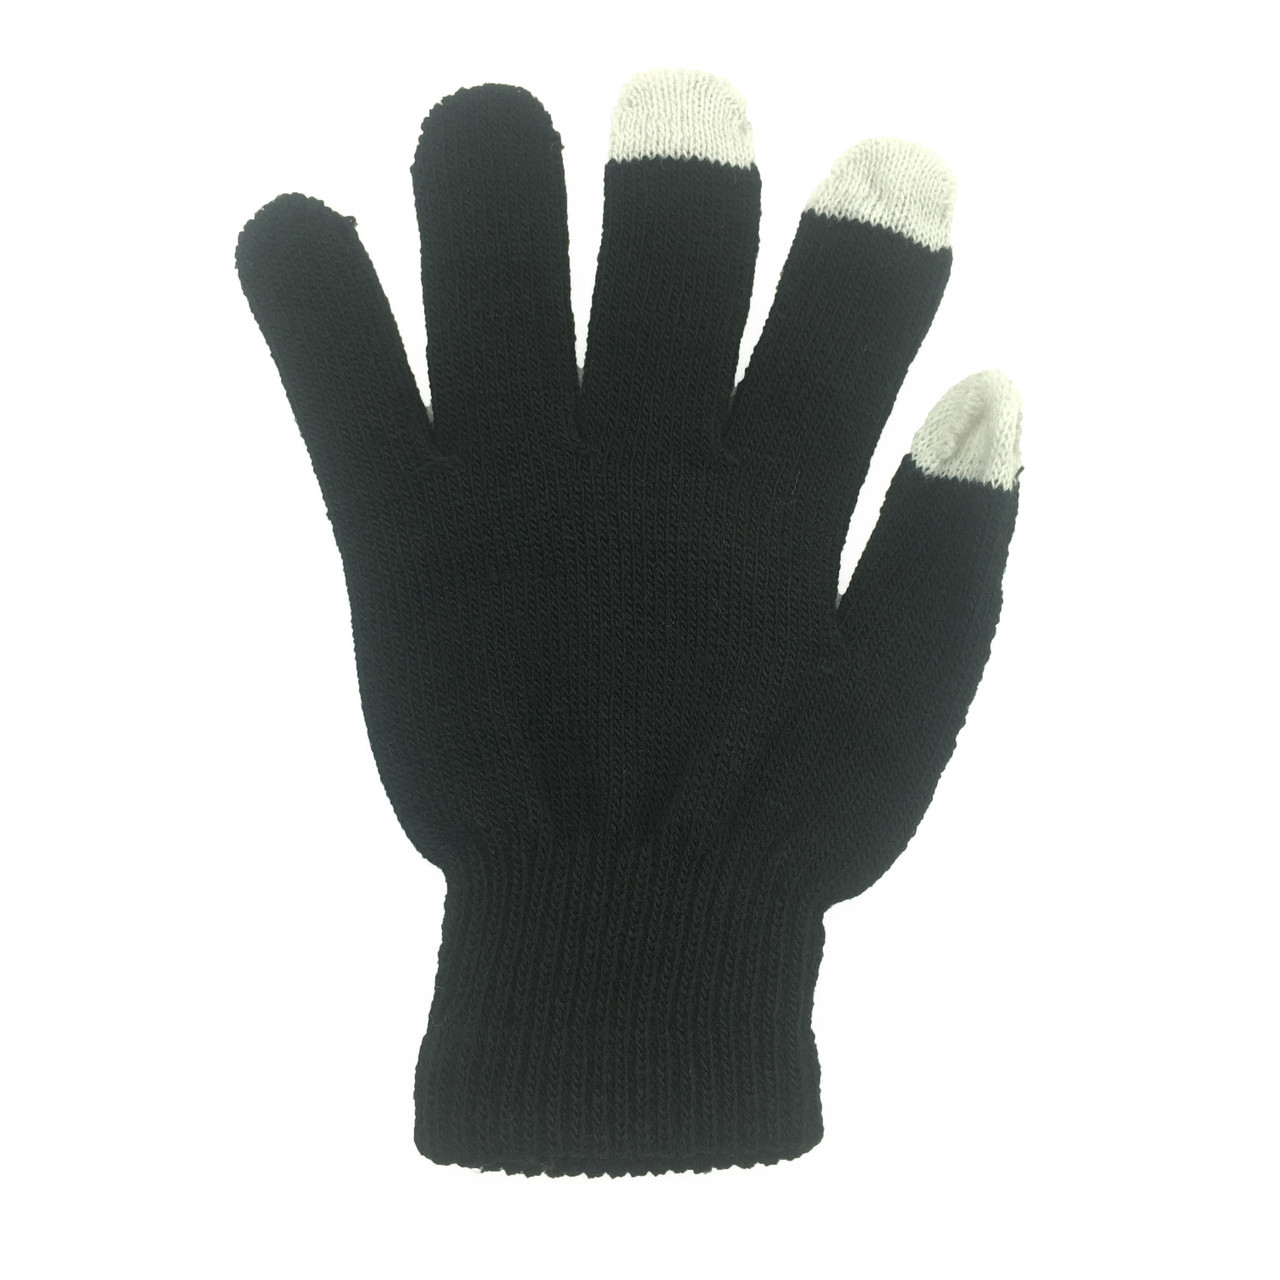 ✅ Перчатки iTouch для сенсорных экранов Black